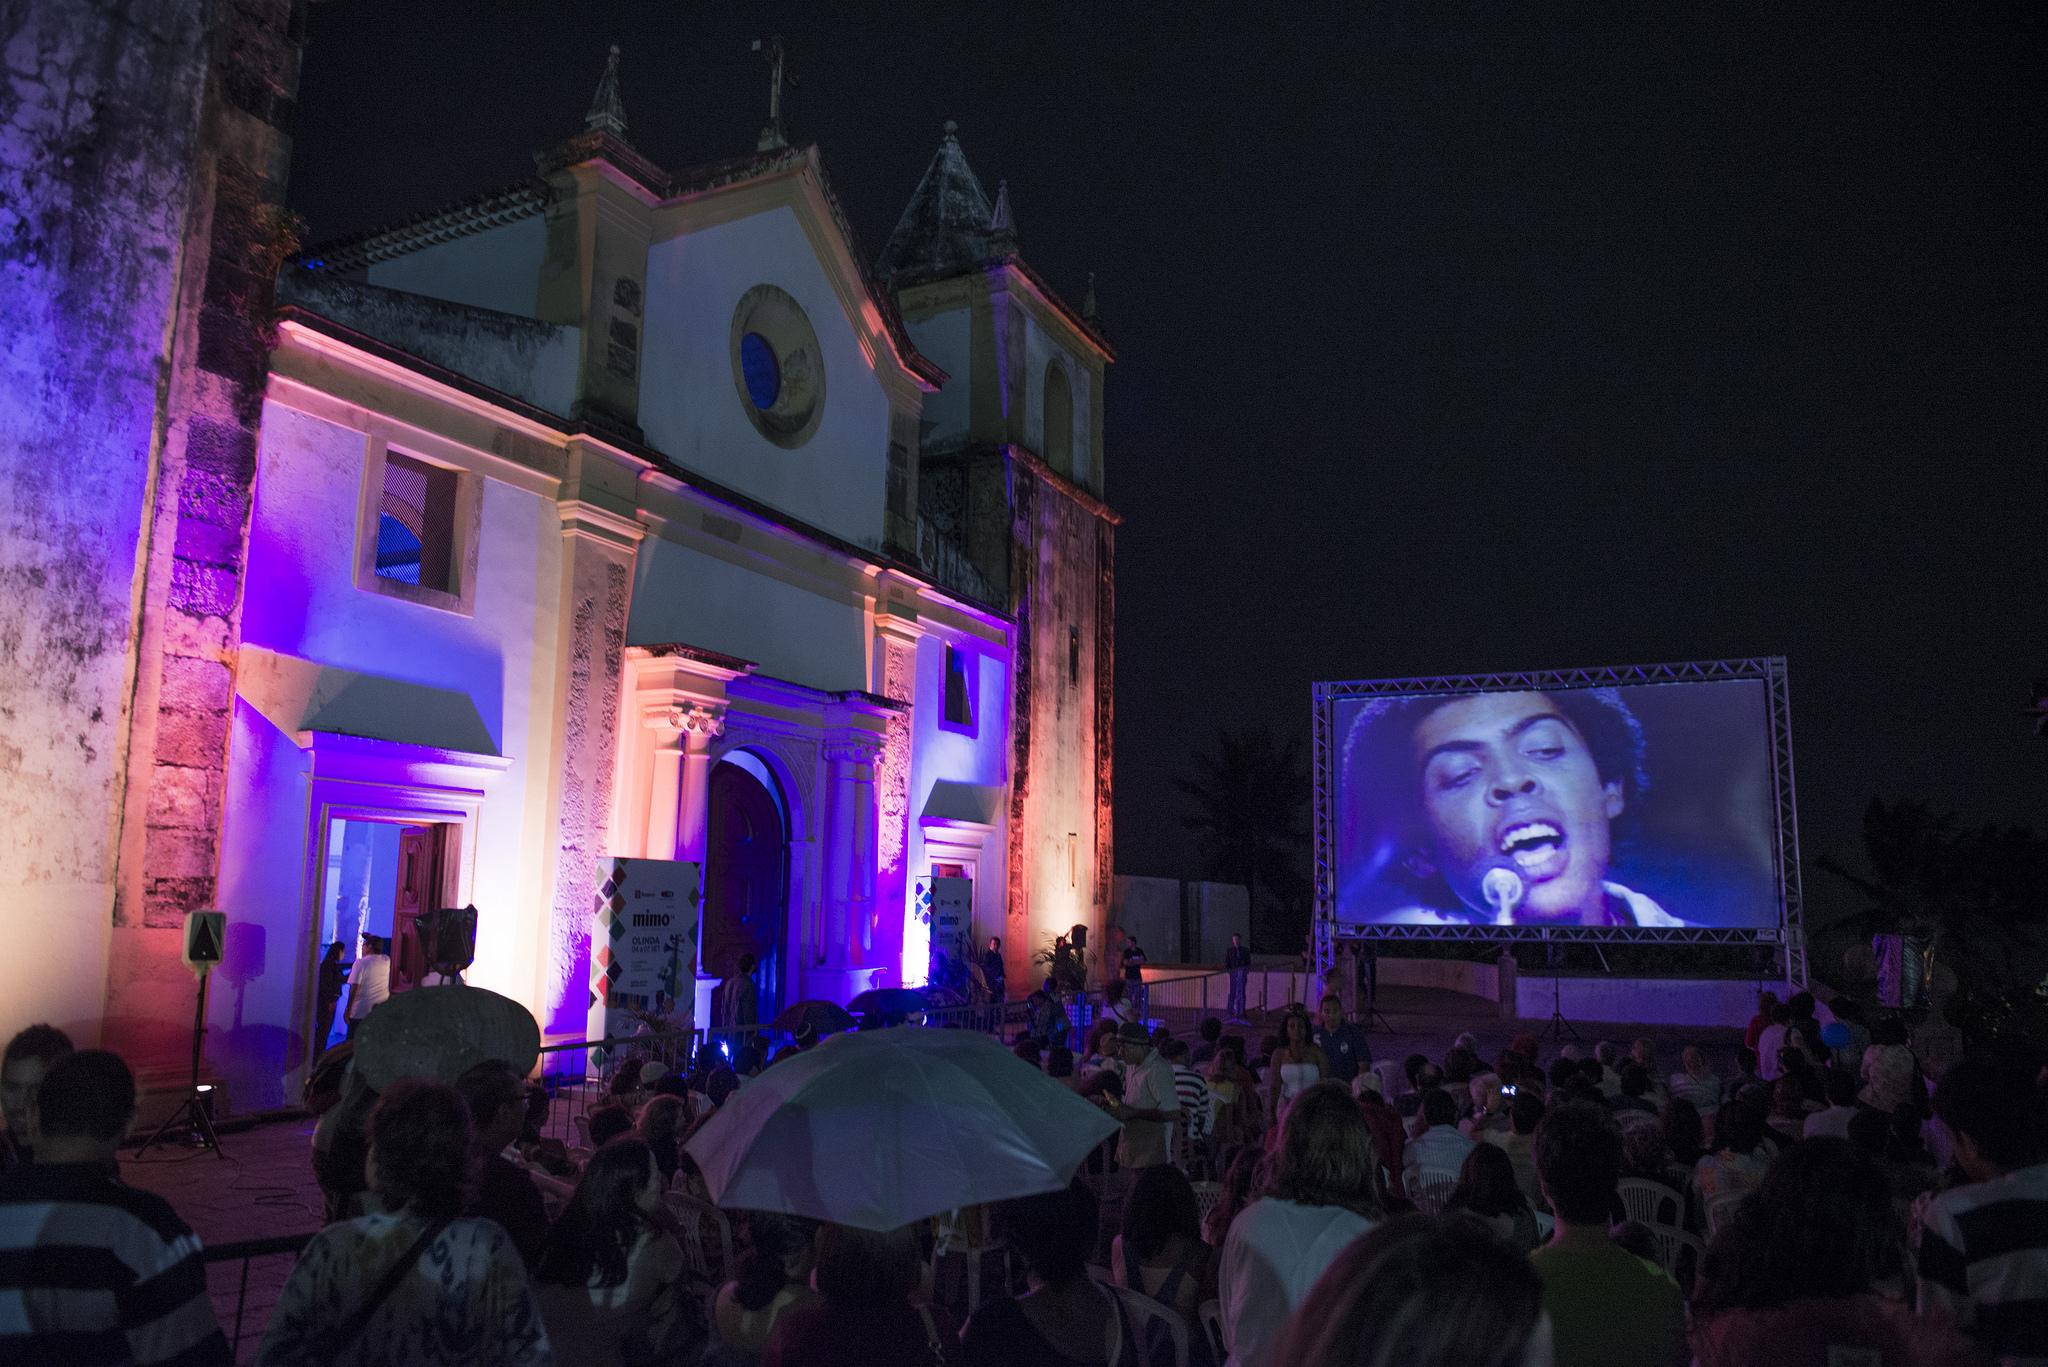 Igreja da Sé_credito Tiago Calazans